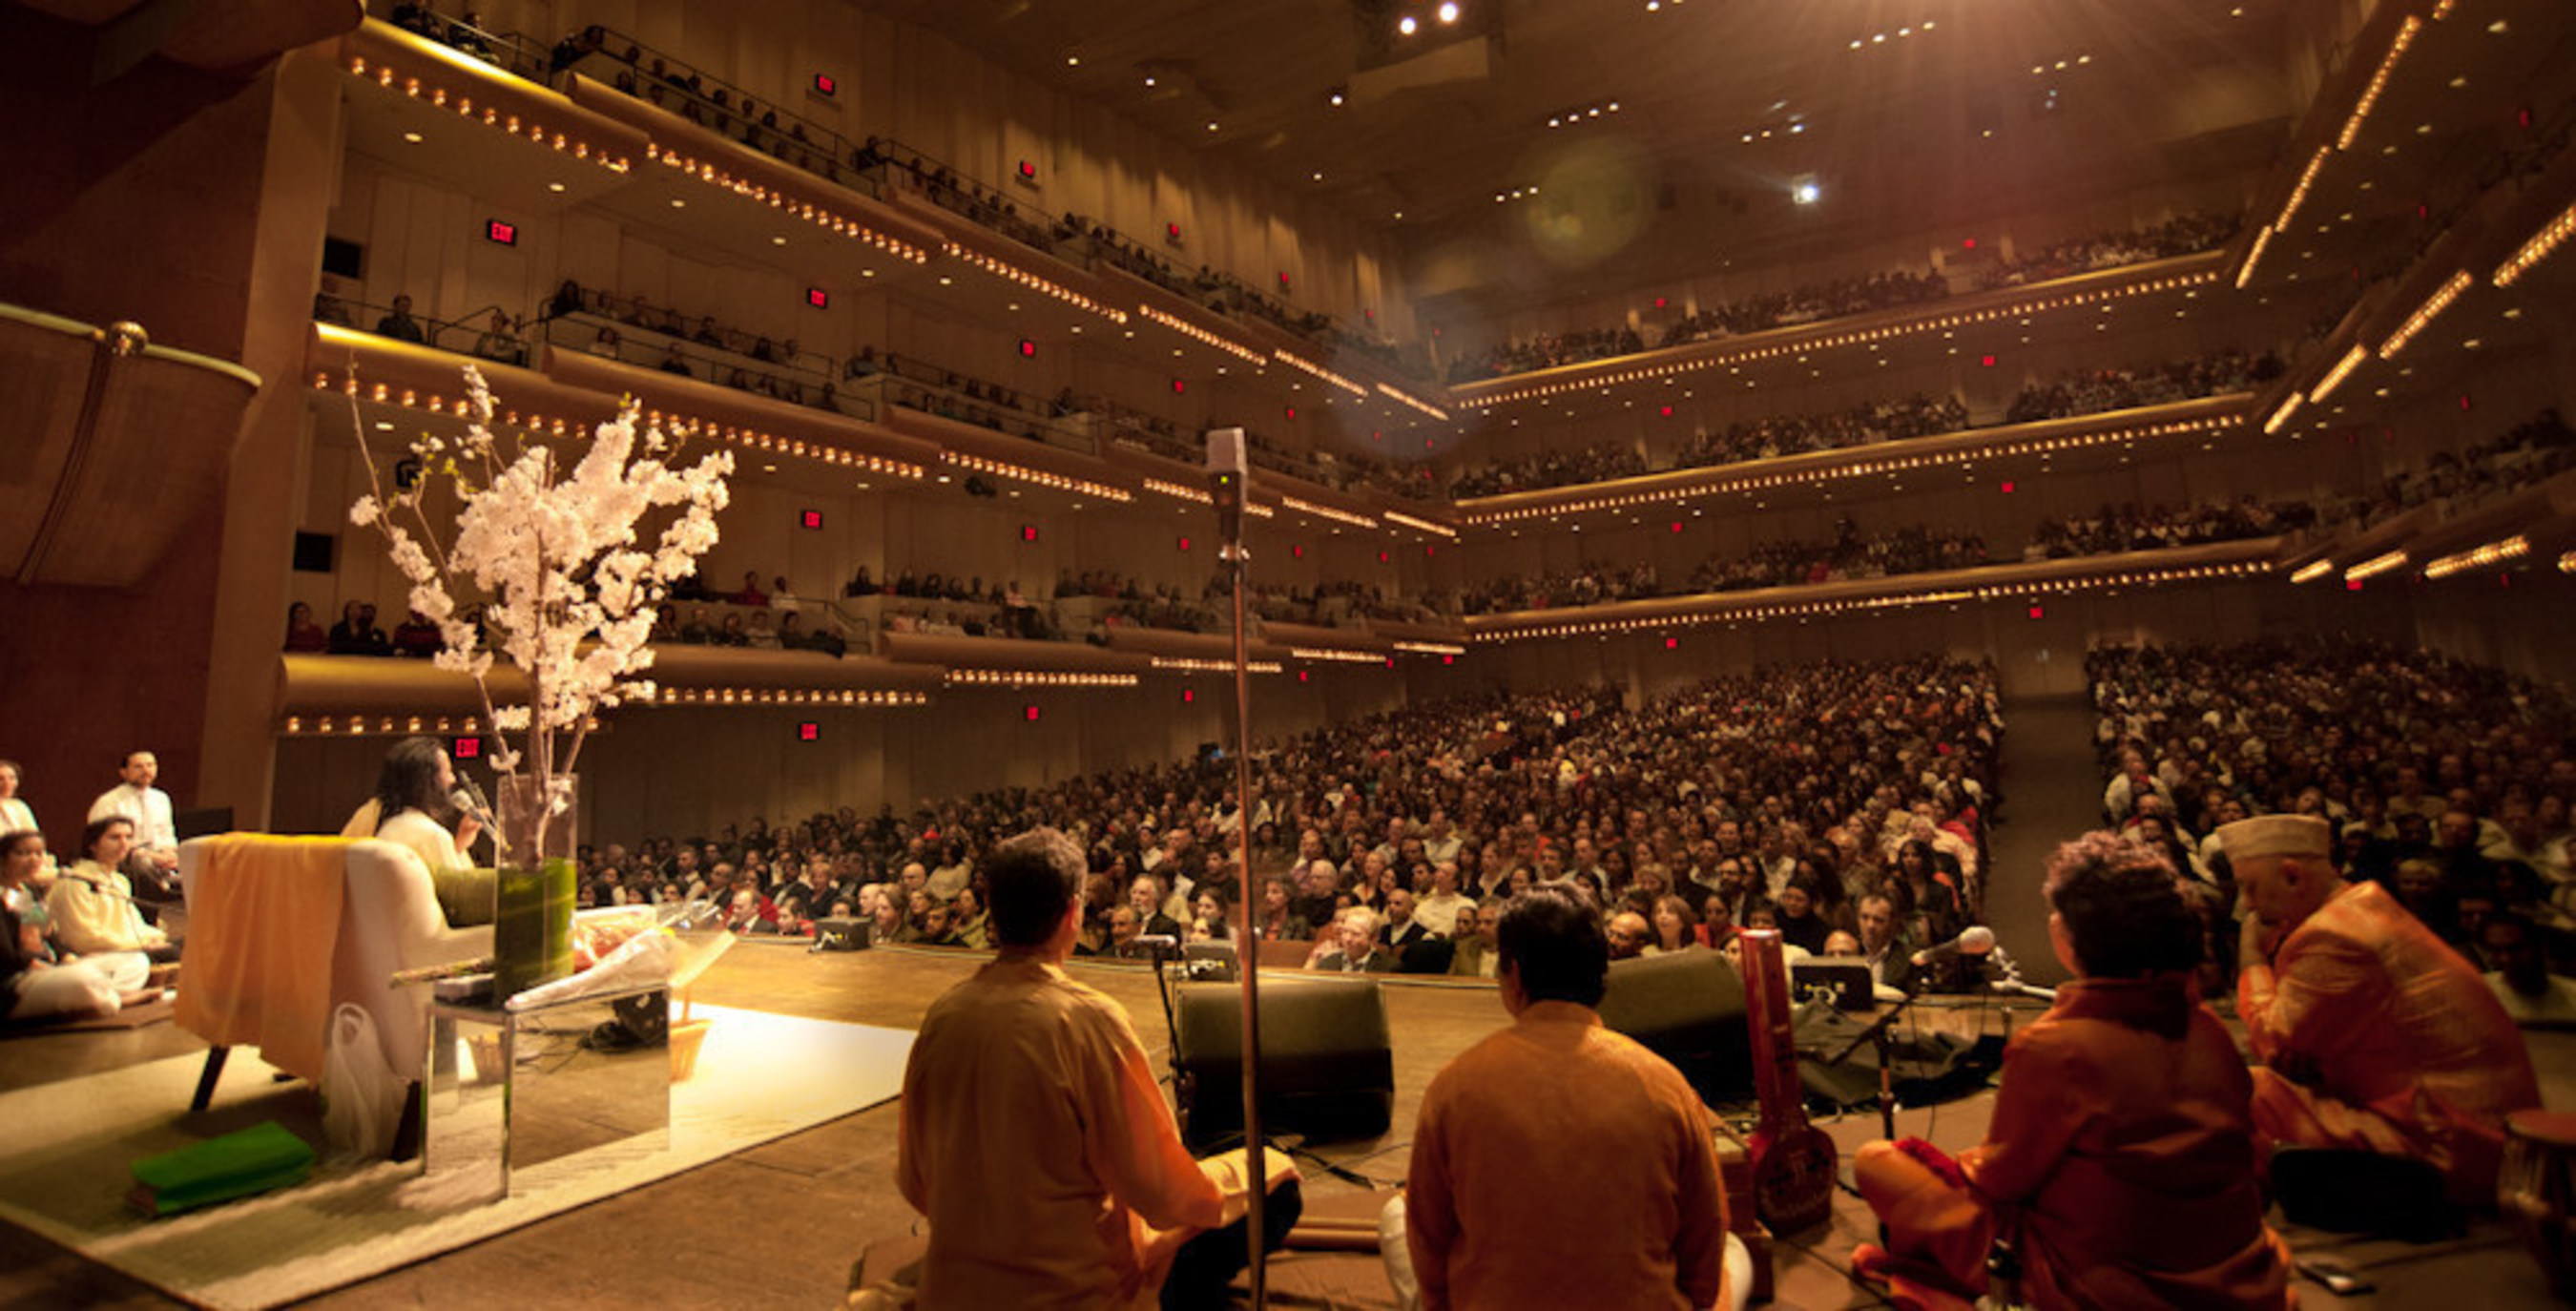 Sri Sri Ravi Shankar at New York's Iconic Lincoln Center